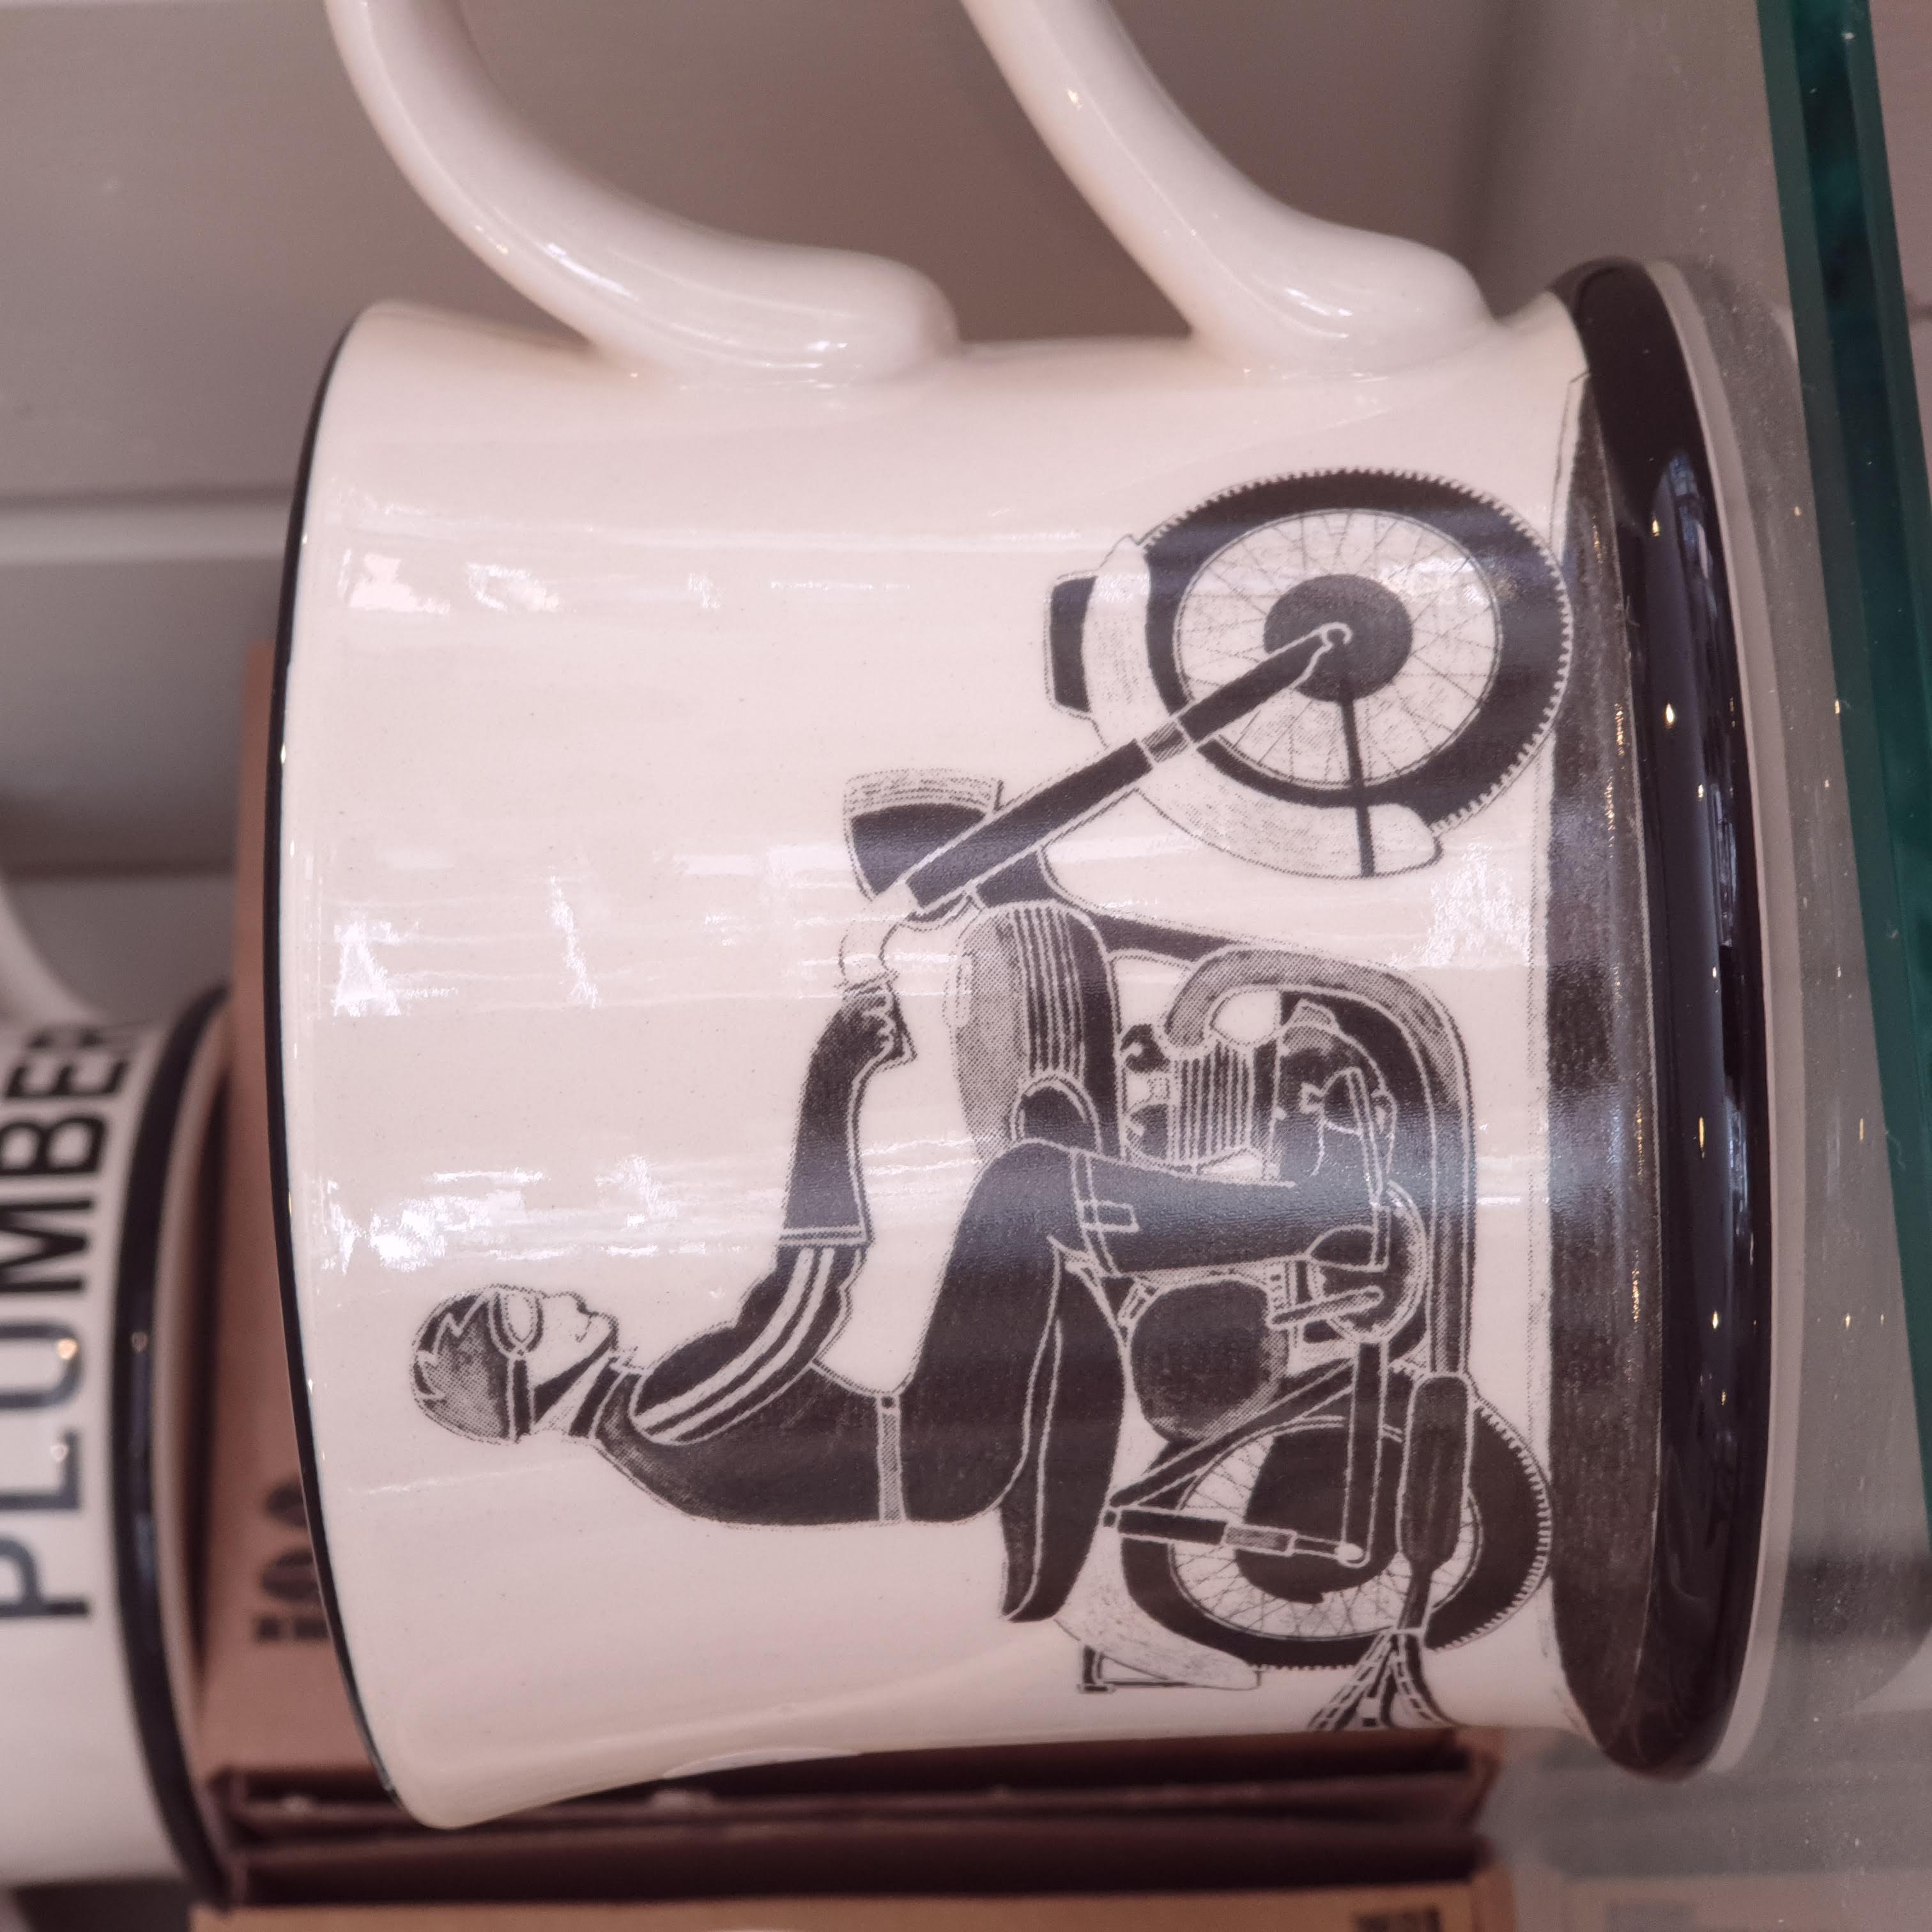 Moorland Pottery - 'Born to Ride' Motorcycle Mug